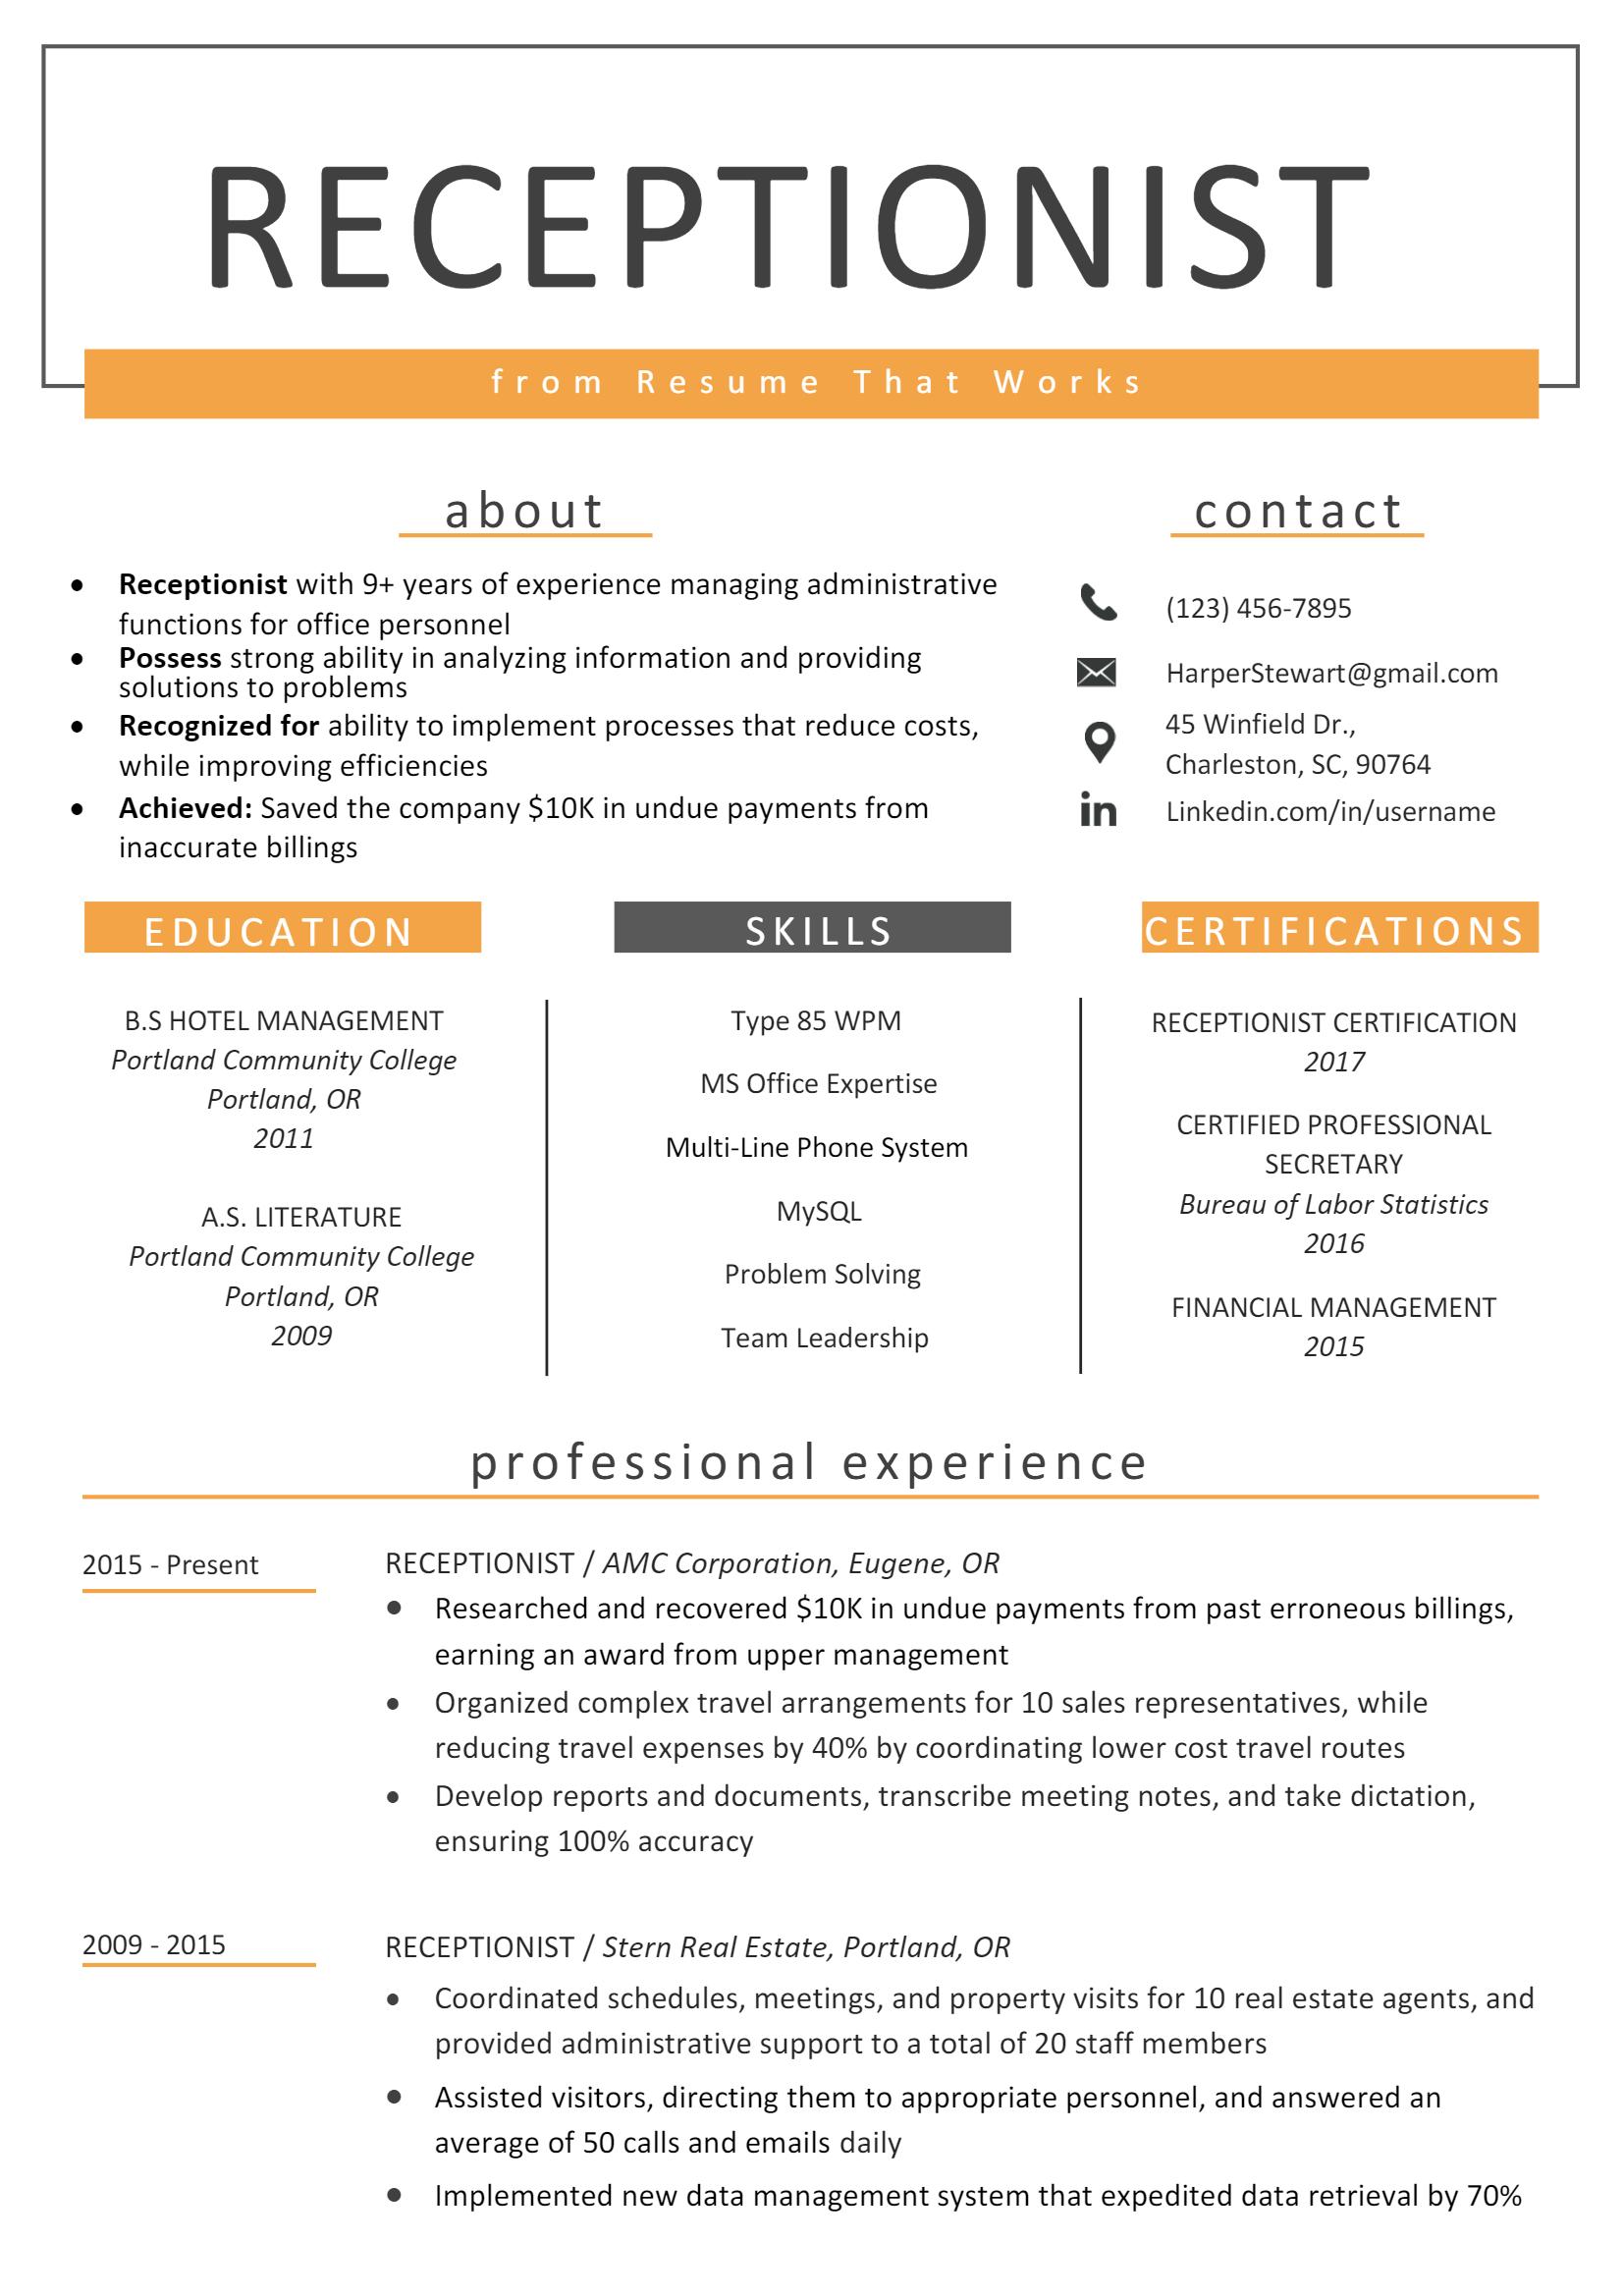 Receptionist Resume